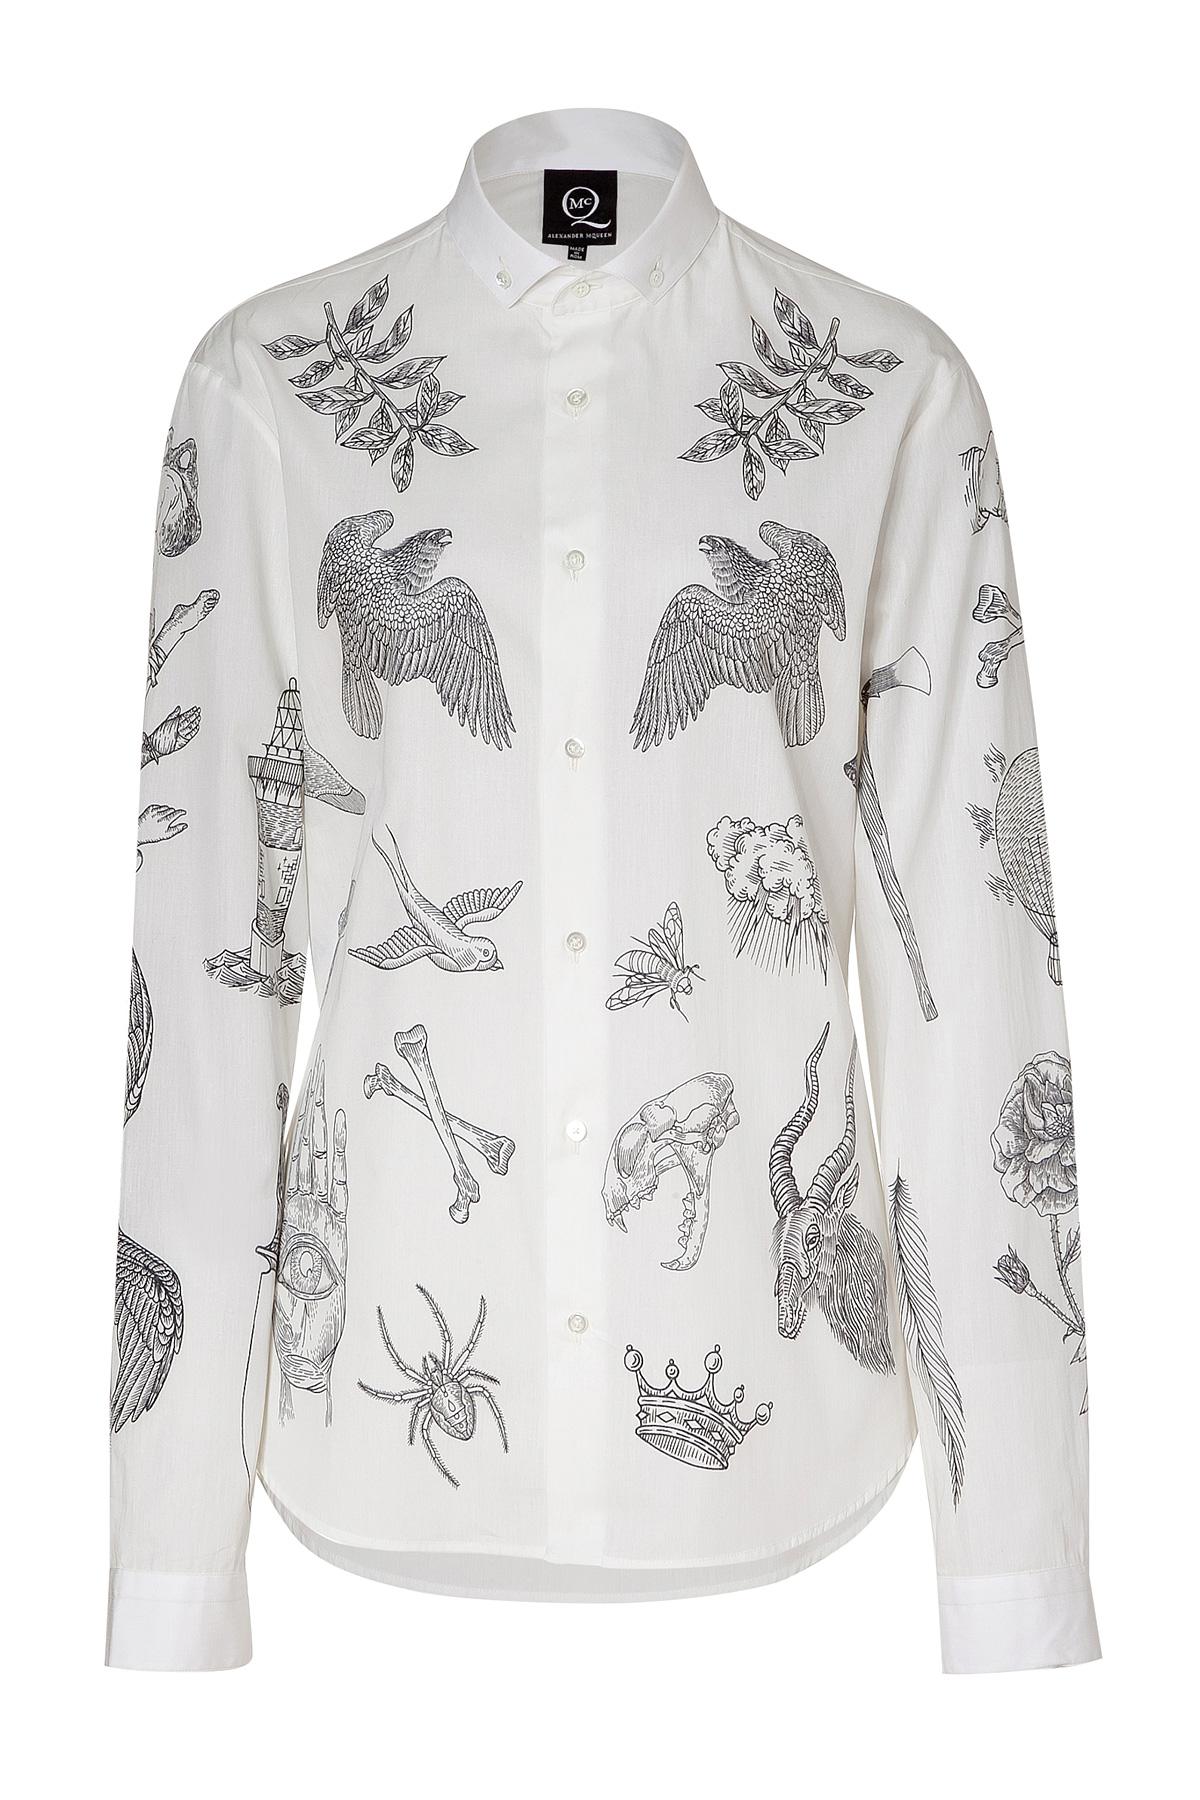 Lyst mcq soft white tattoo print cotton shirt in white for Soft cotton dress shirts